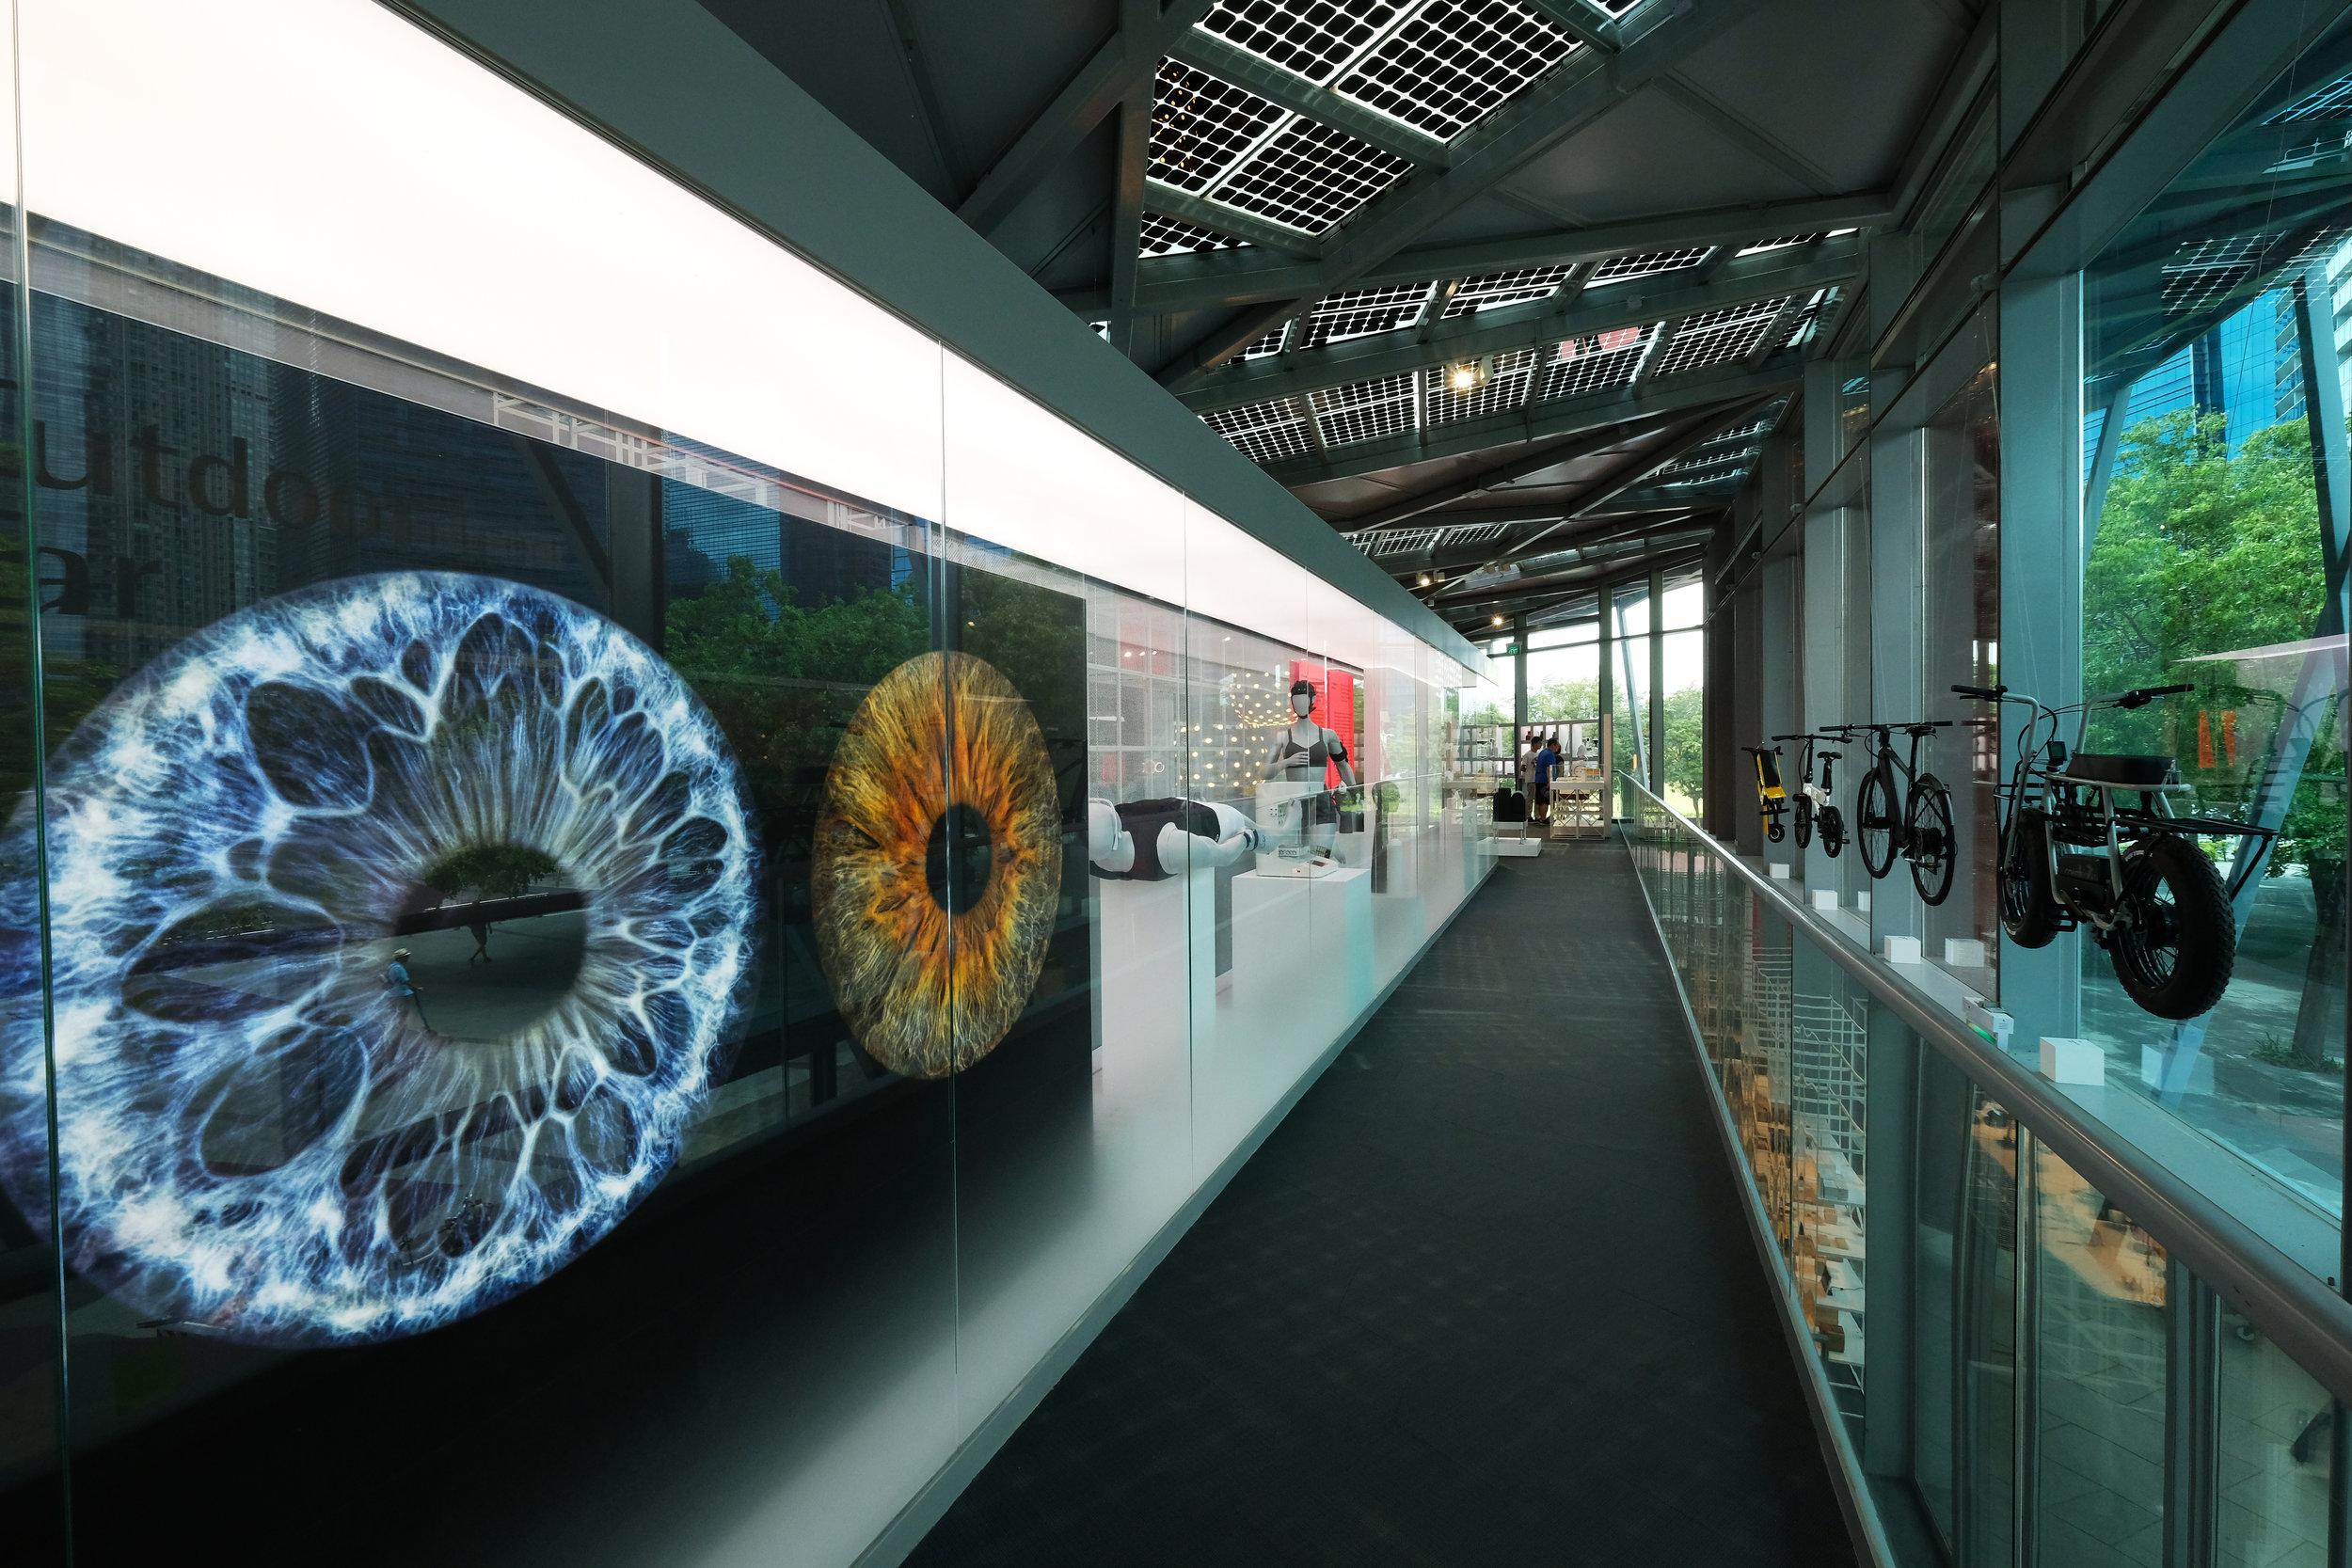 02_Museum Gallery - Human-Nature 2.JPG